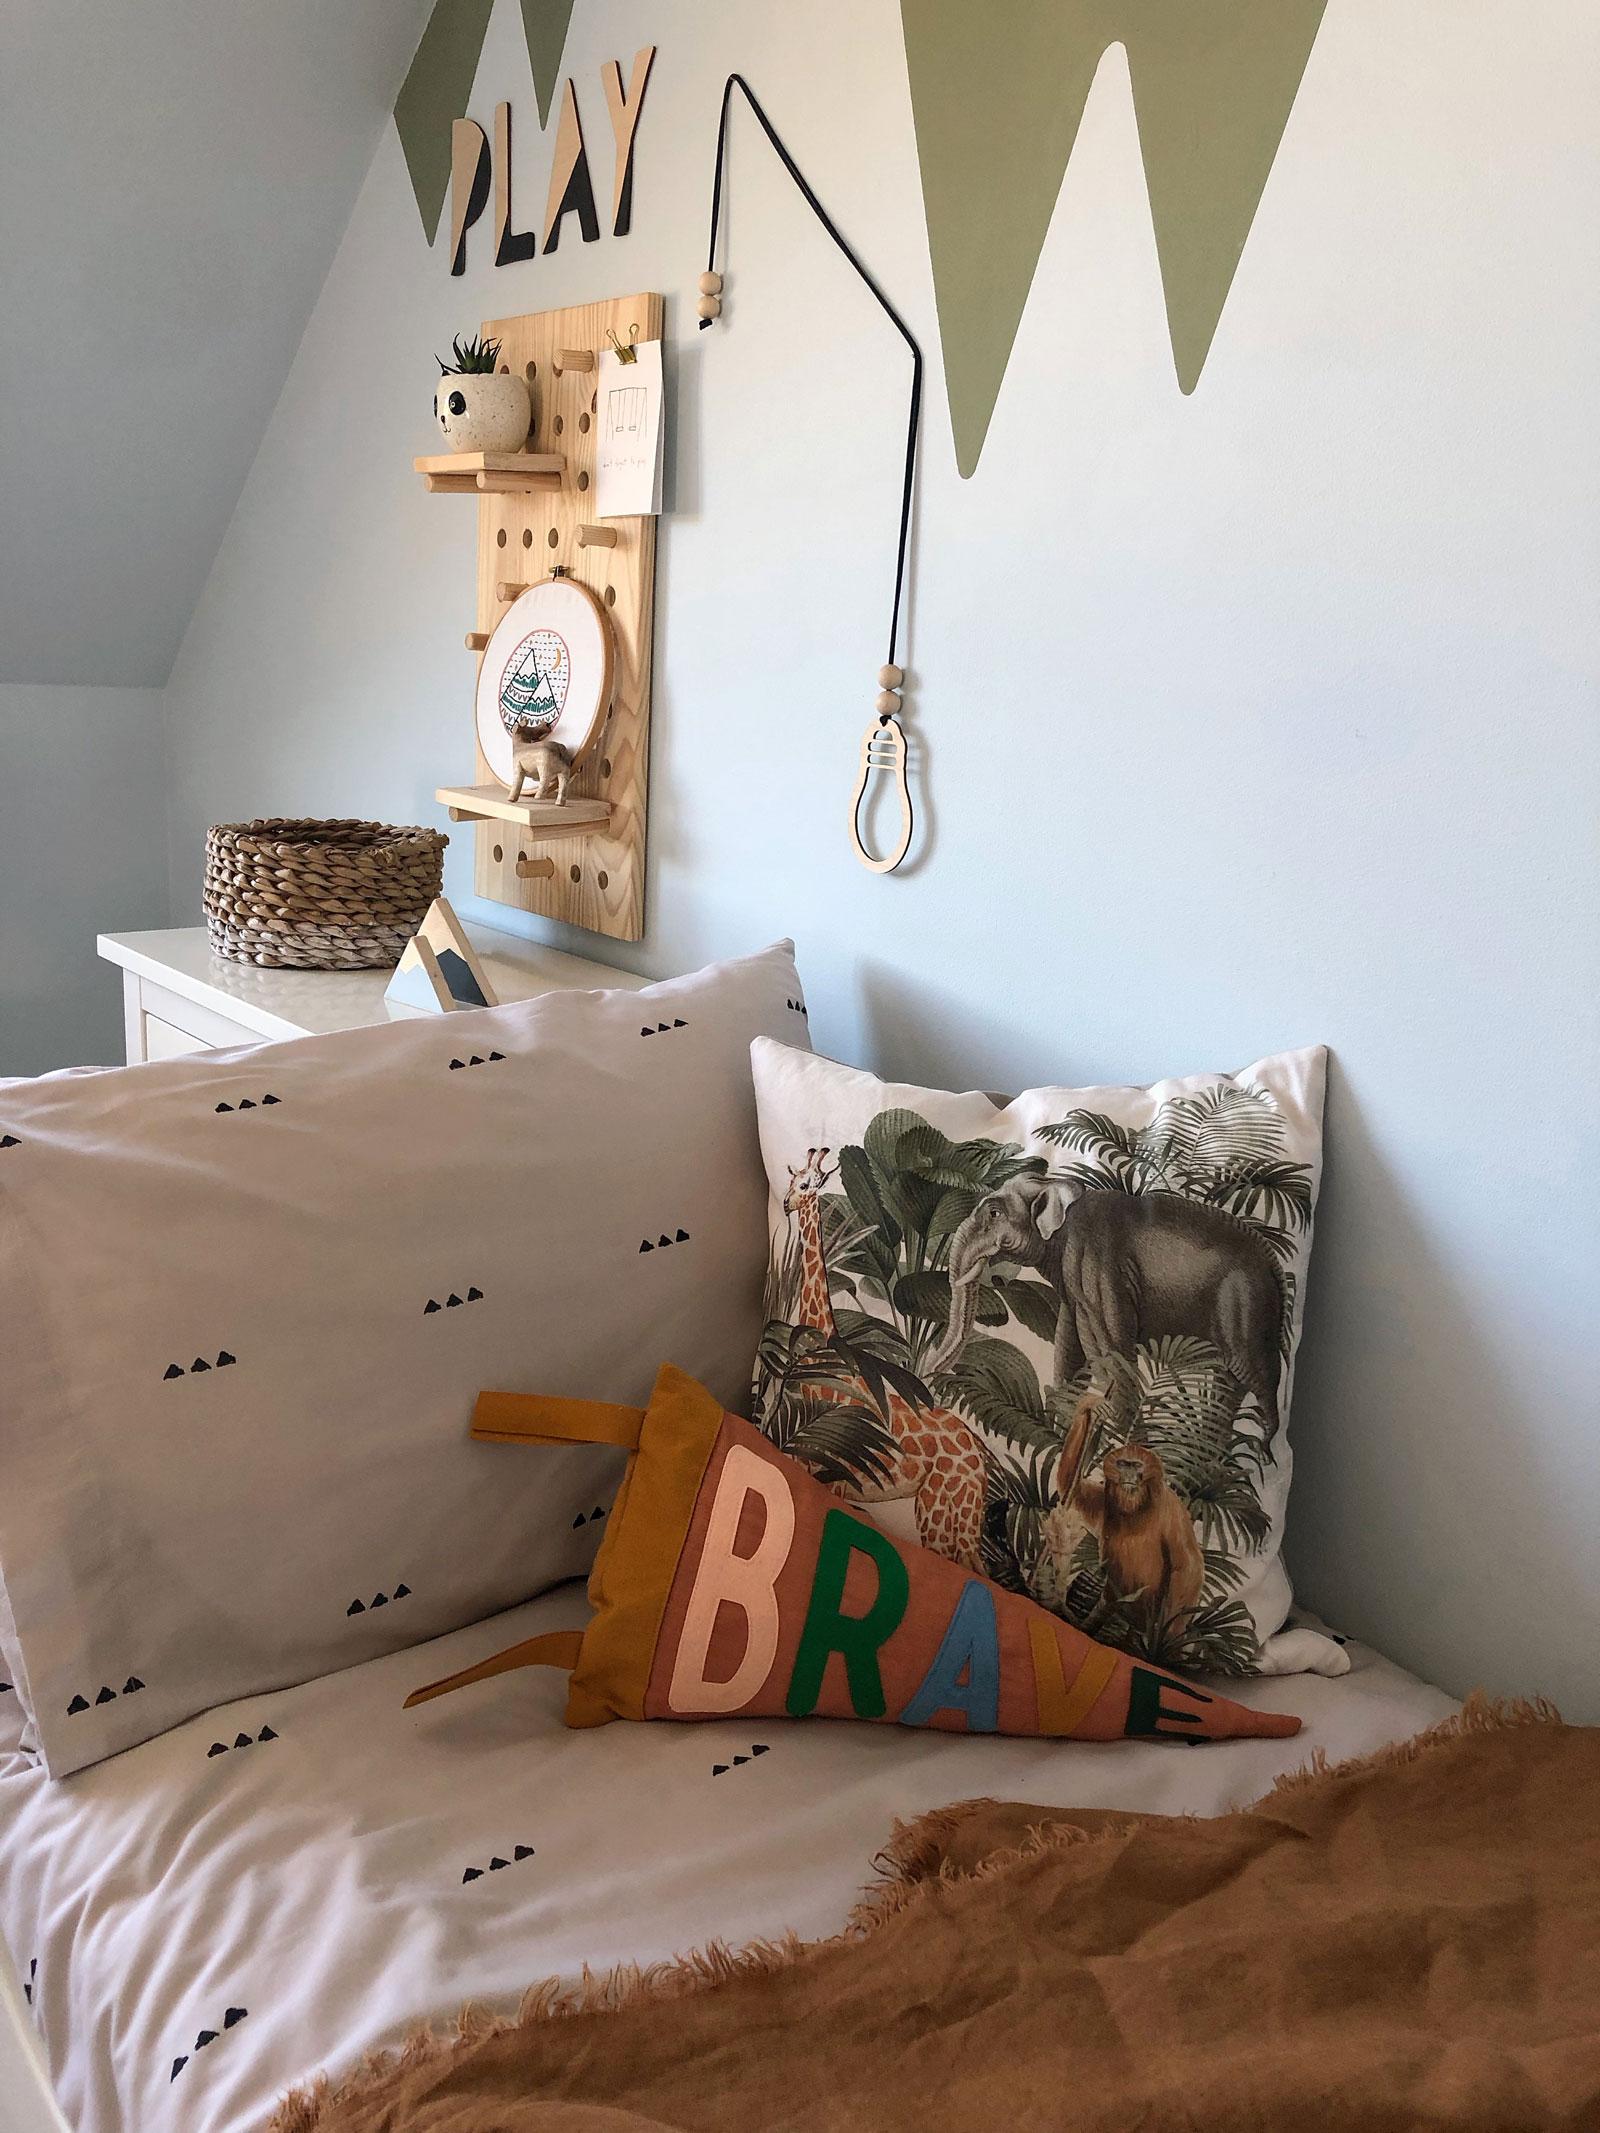 banner style cushion handmade